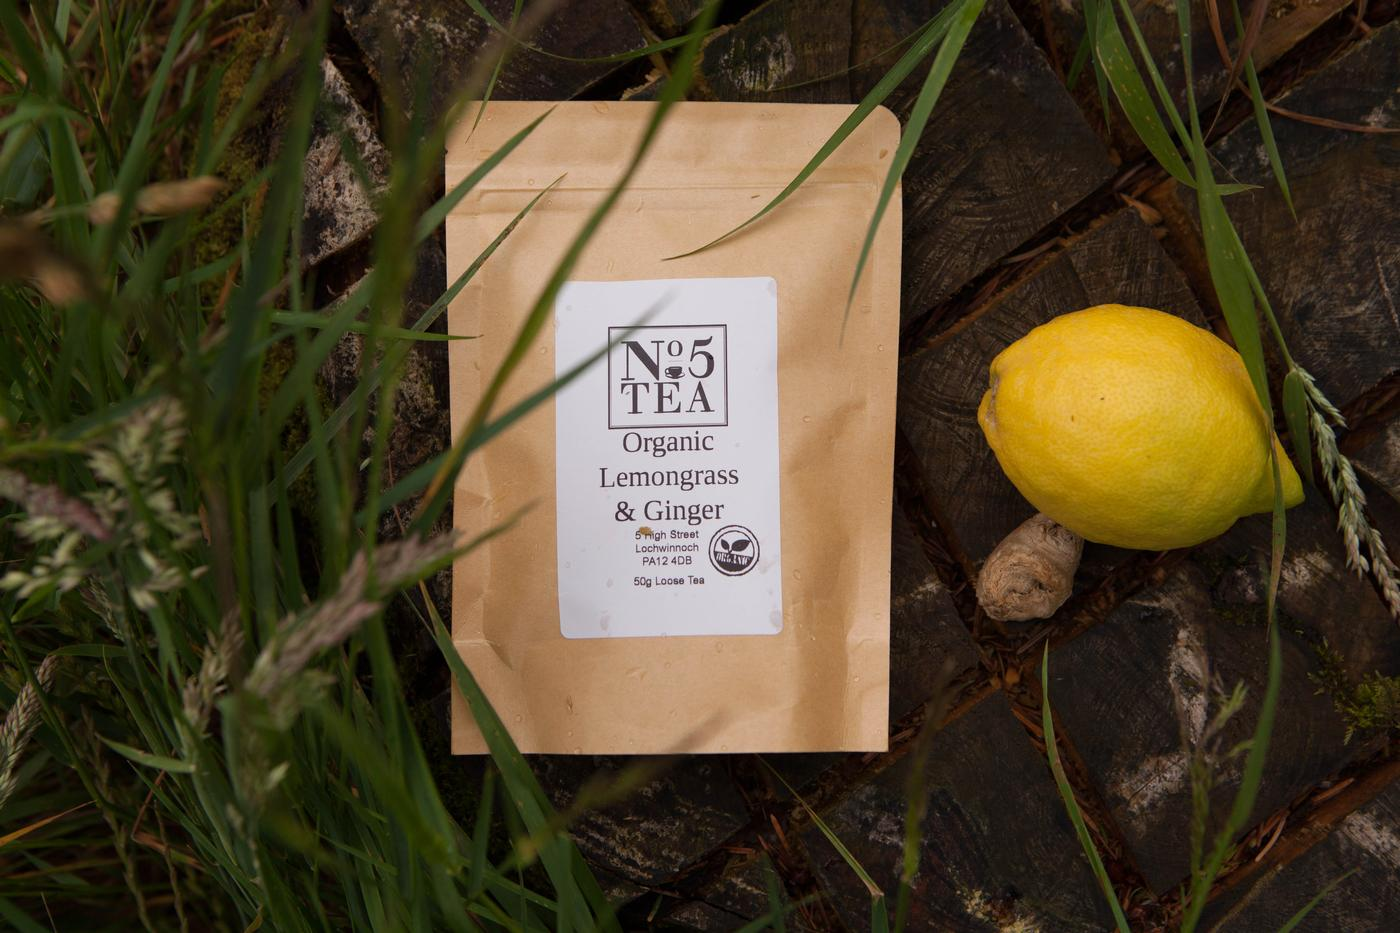 No. 5 Organic Lemongrass and Ginger